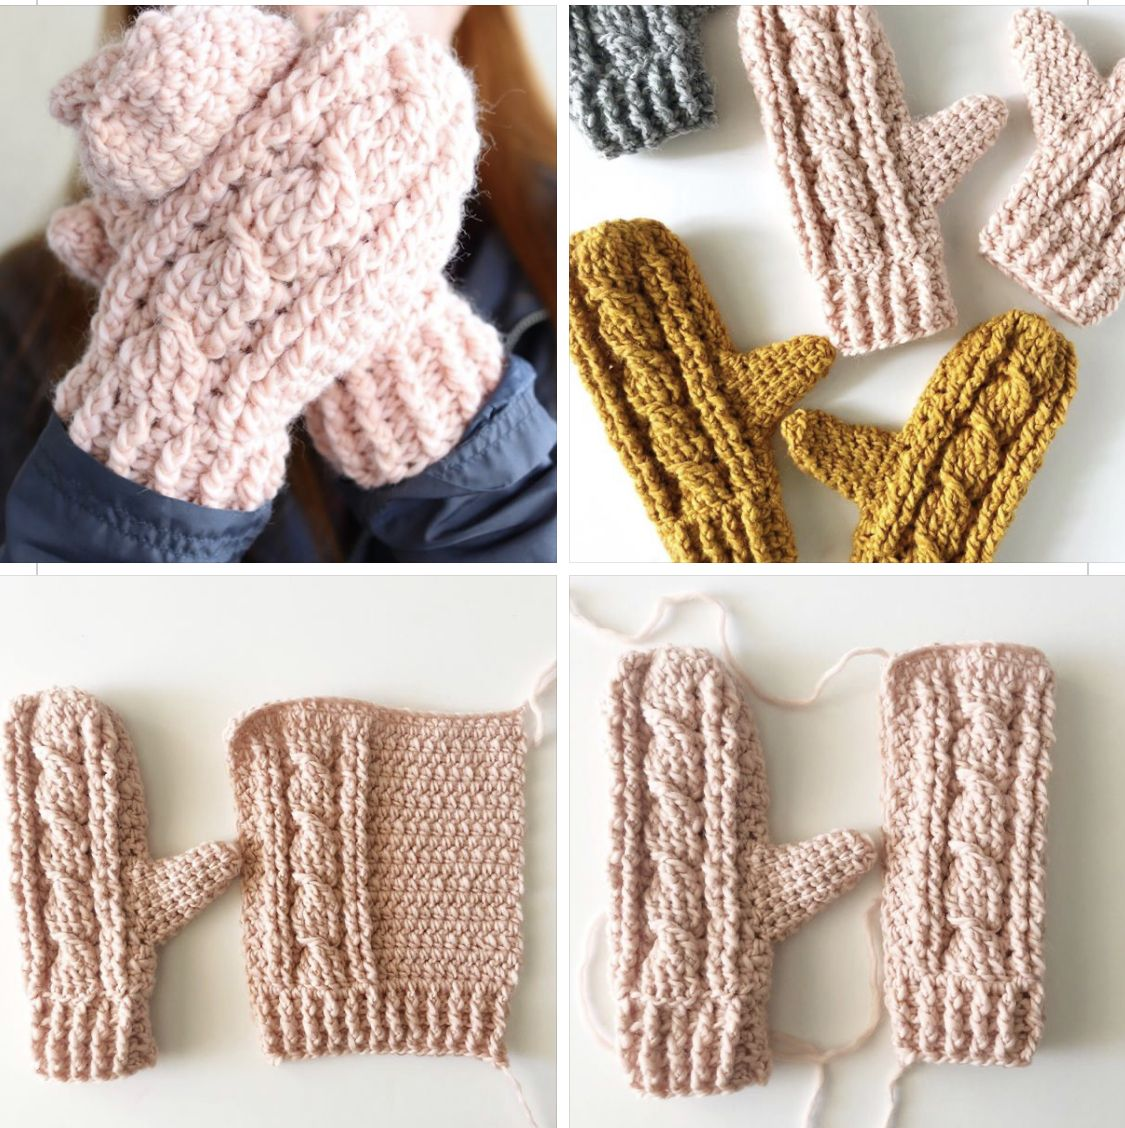 Free Pattern Crochet Mitts Crochet Cable Crochet Mittens